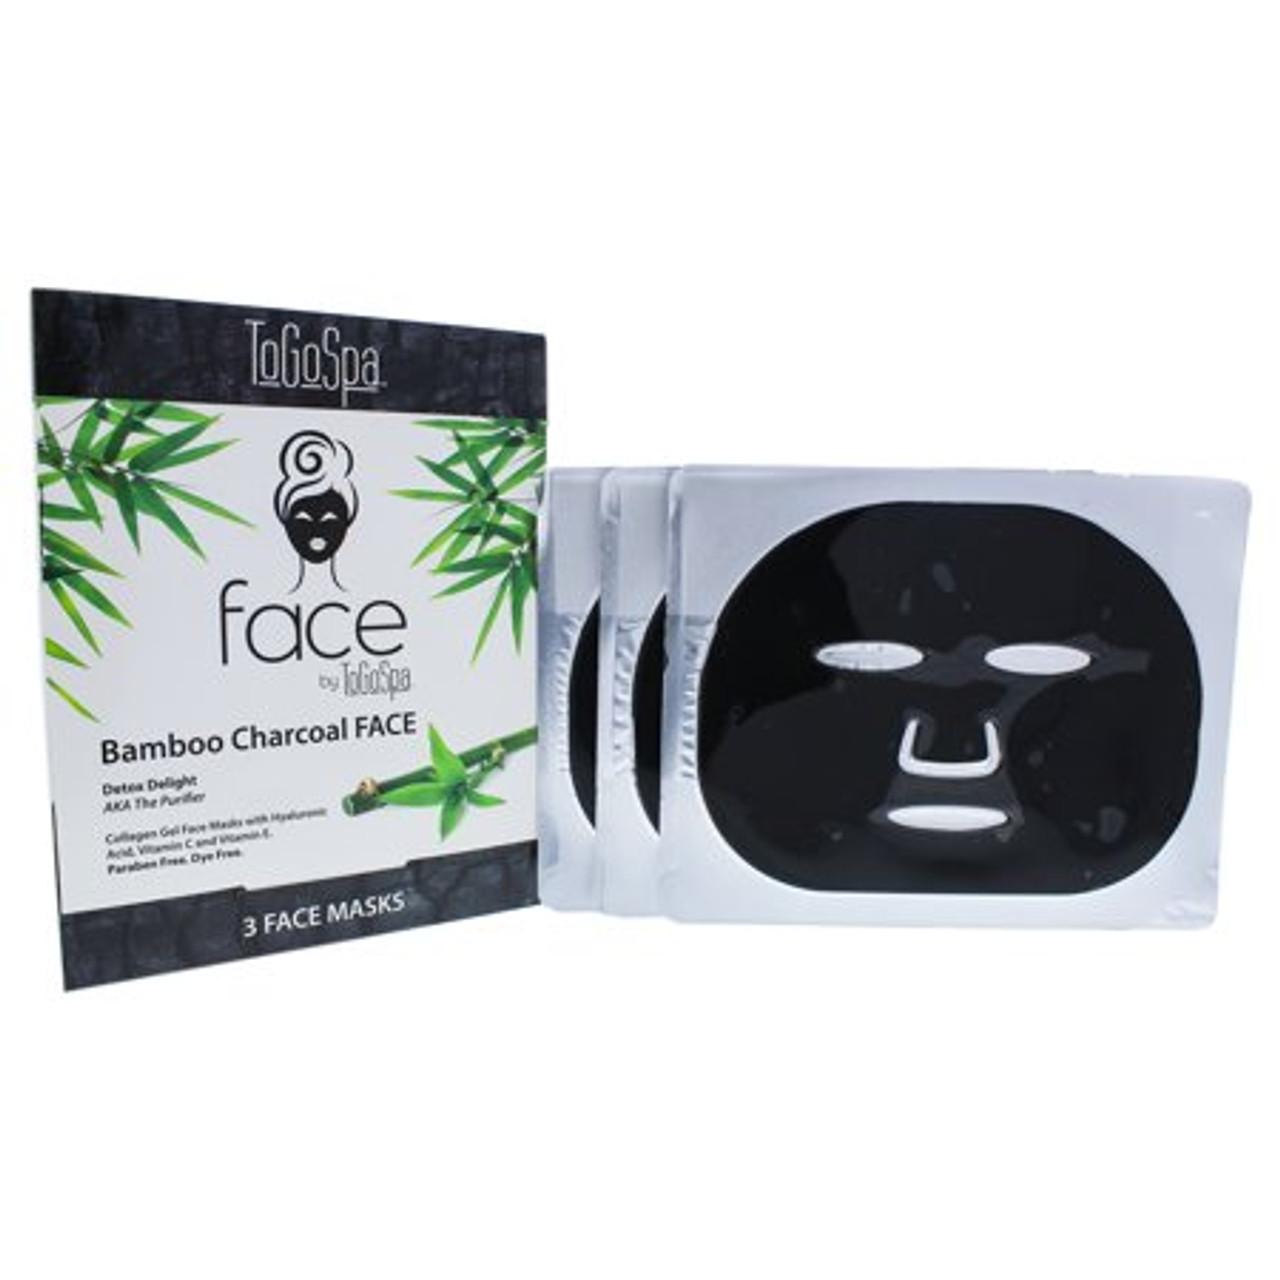 Togo Spa Bamboo Charcoal Mask 3P